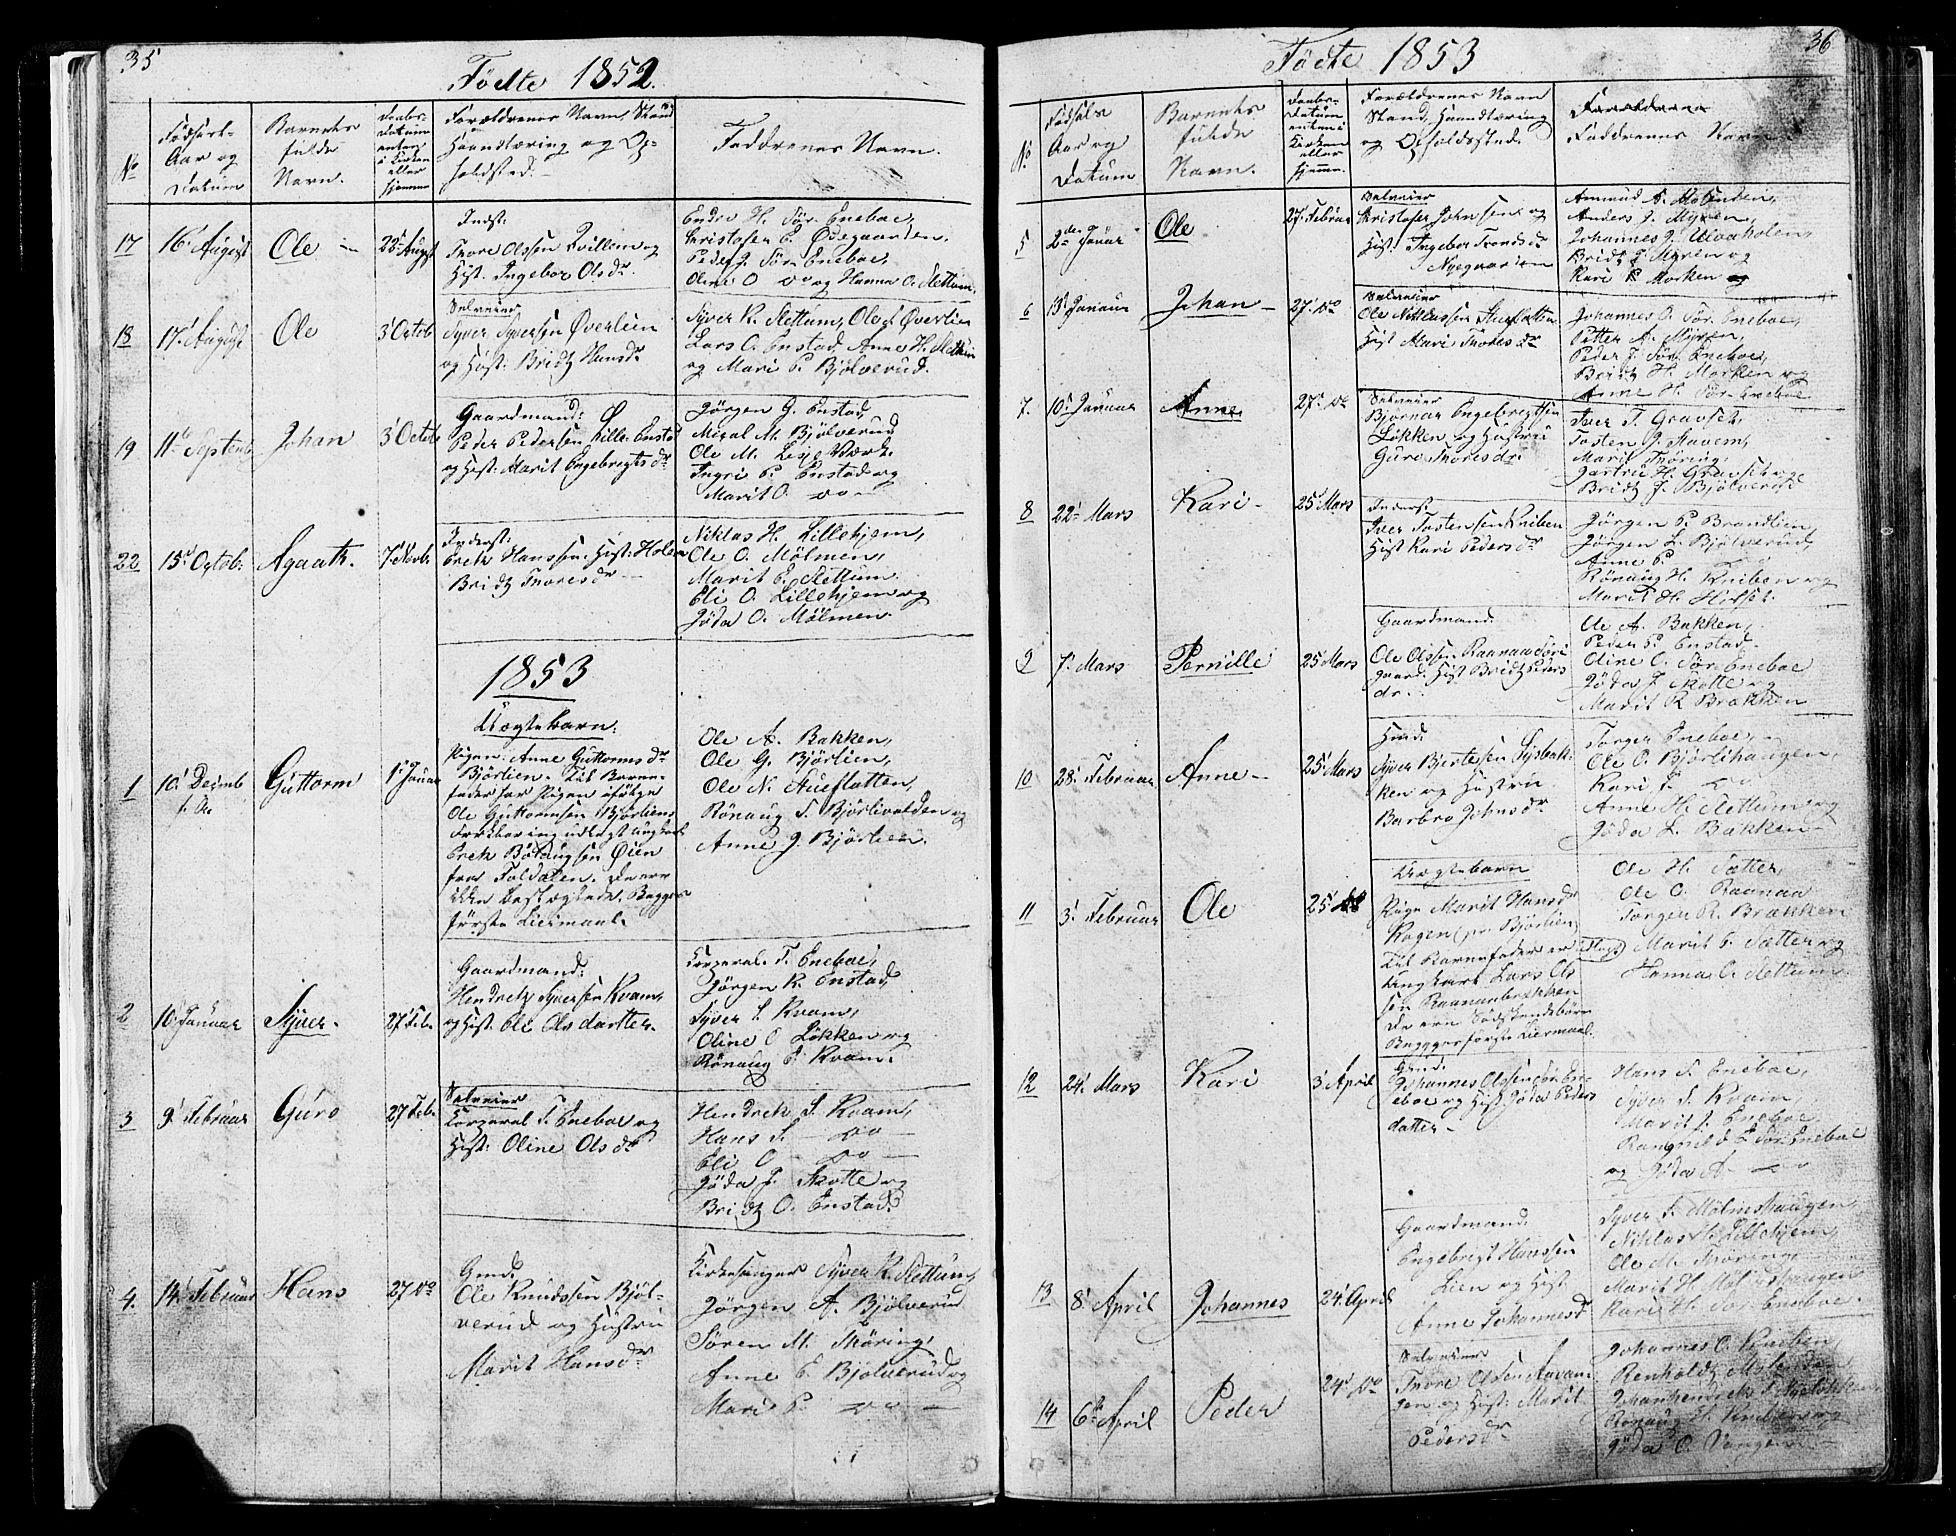 SAH, Lesja prestekontor, Klokkerbok nr. 4, 1842-1871, s. 35-36